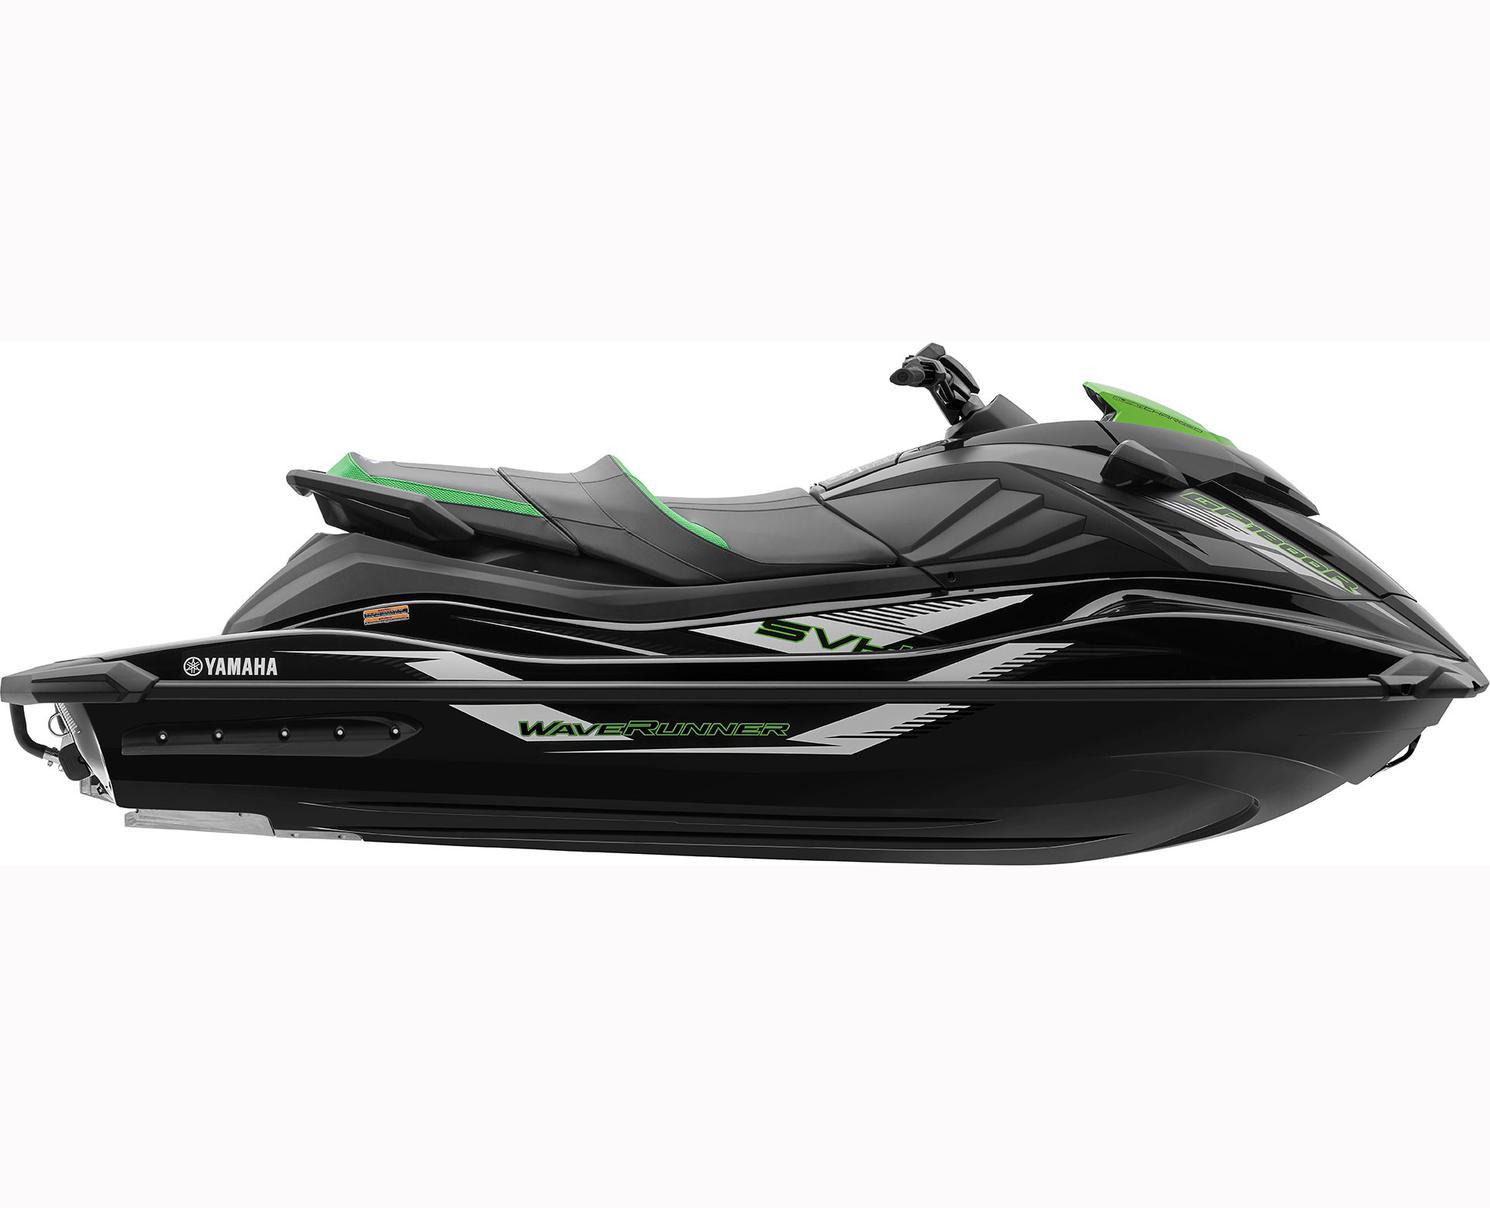 Yamaha GP1800R SVHO Noir/Vert Citron 2021